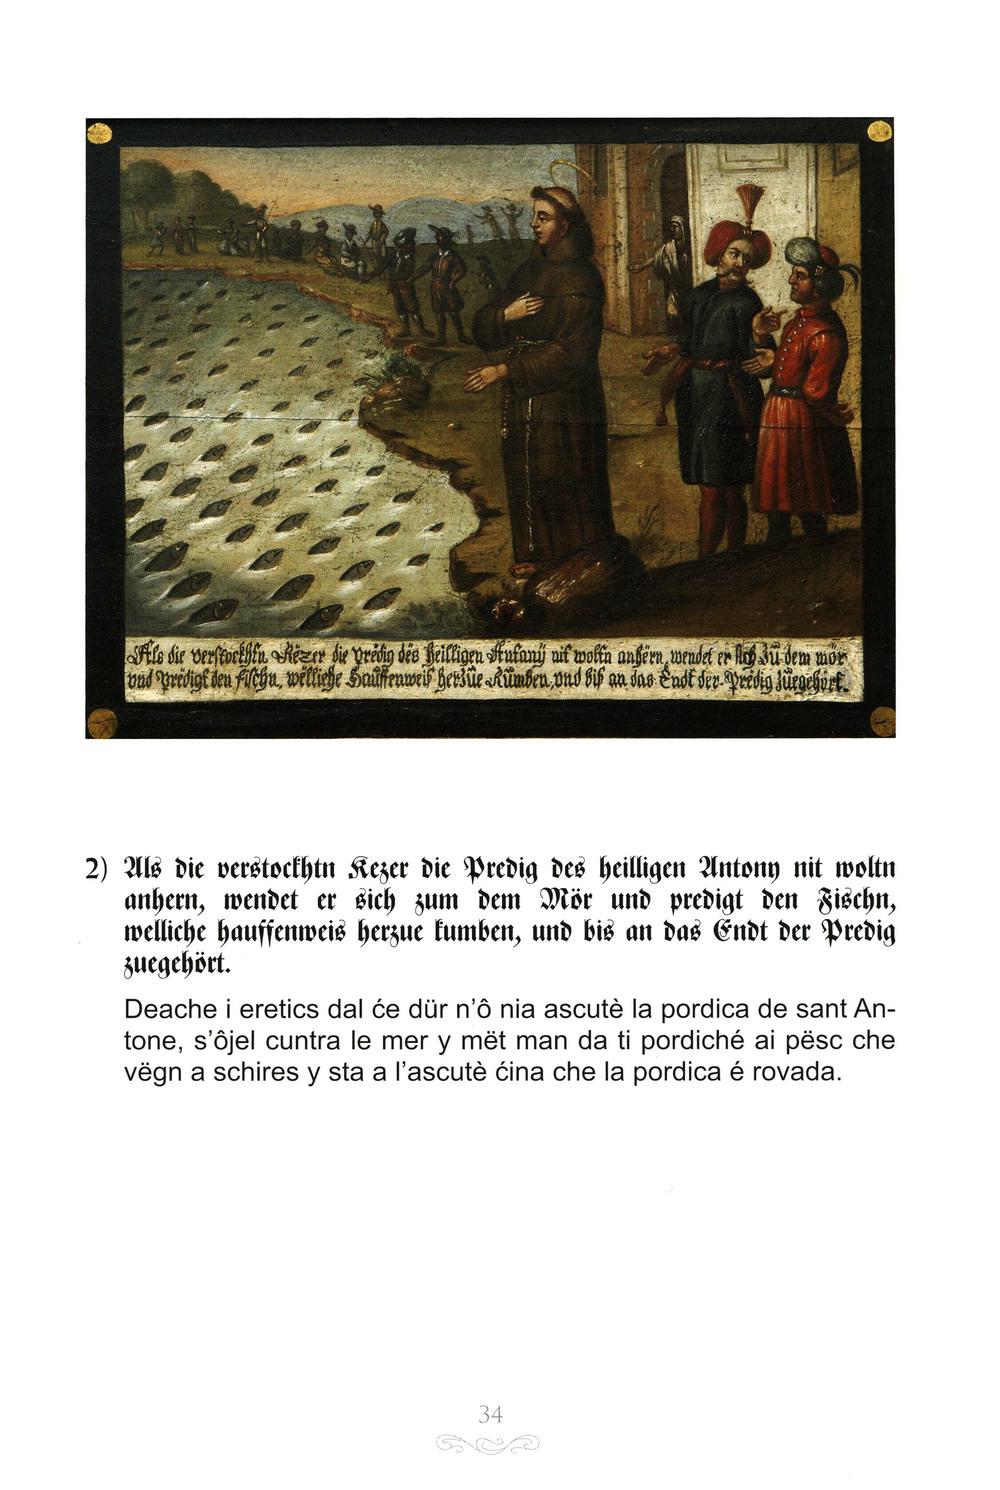 La dlijia de Sant Antone